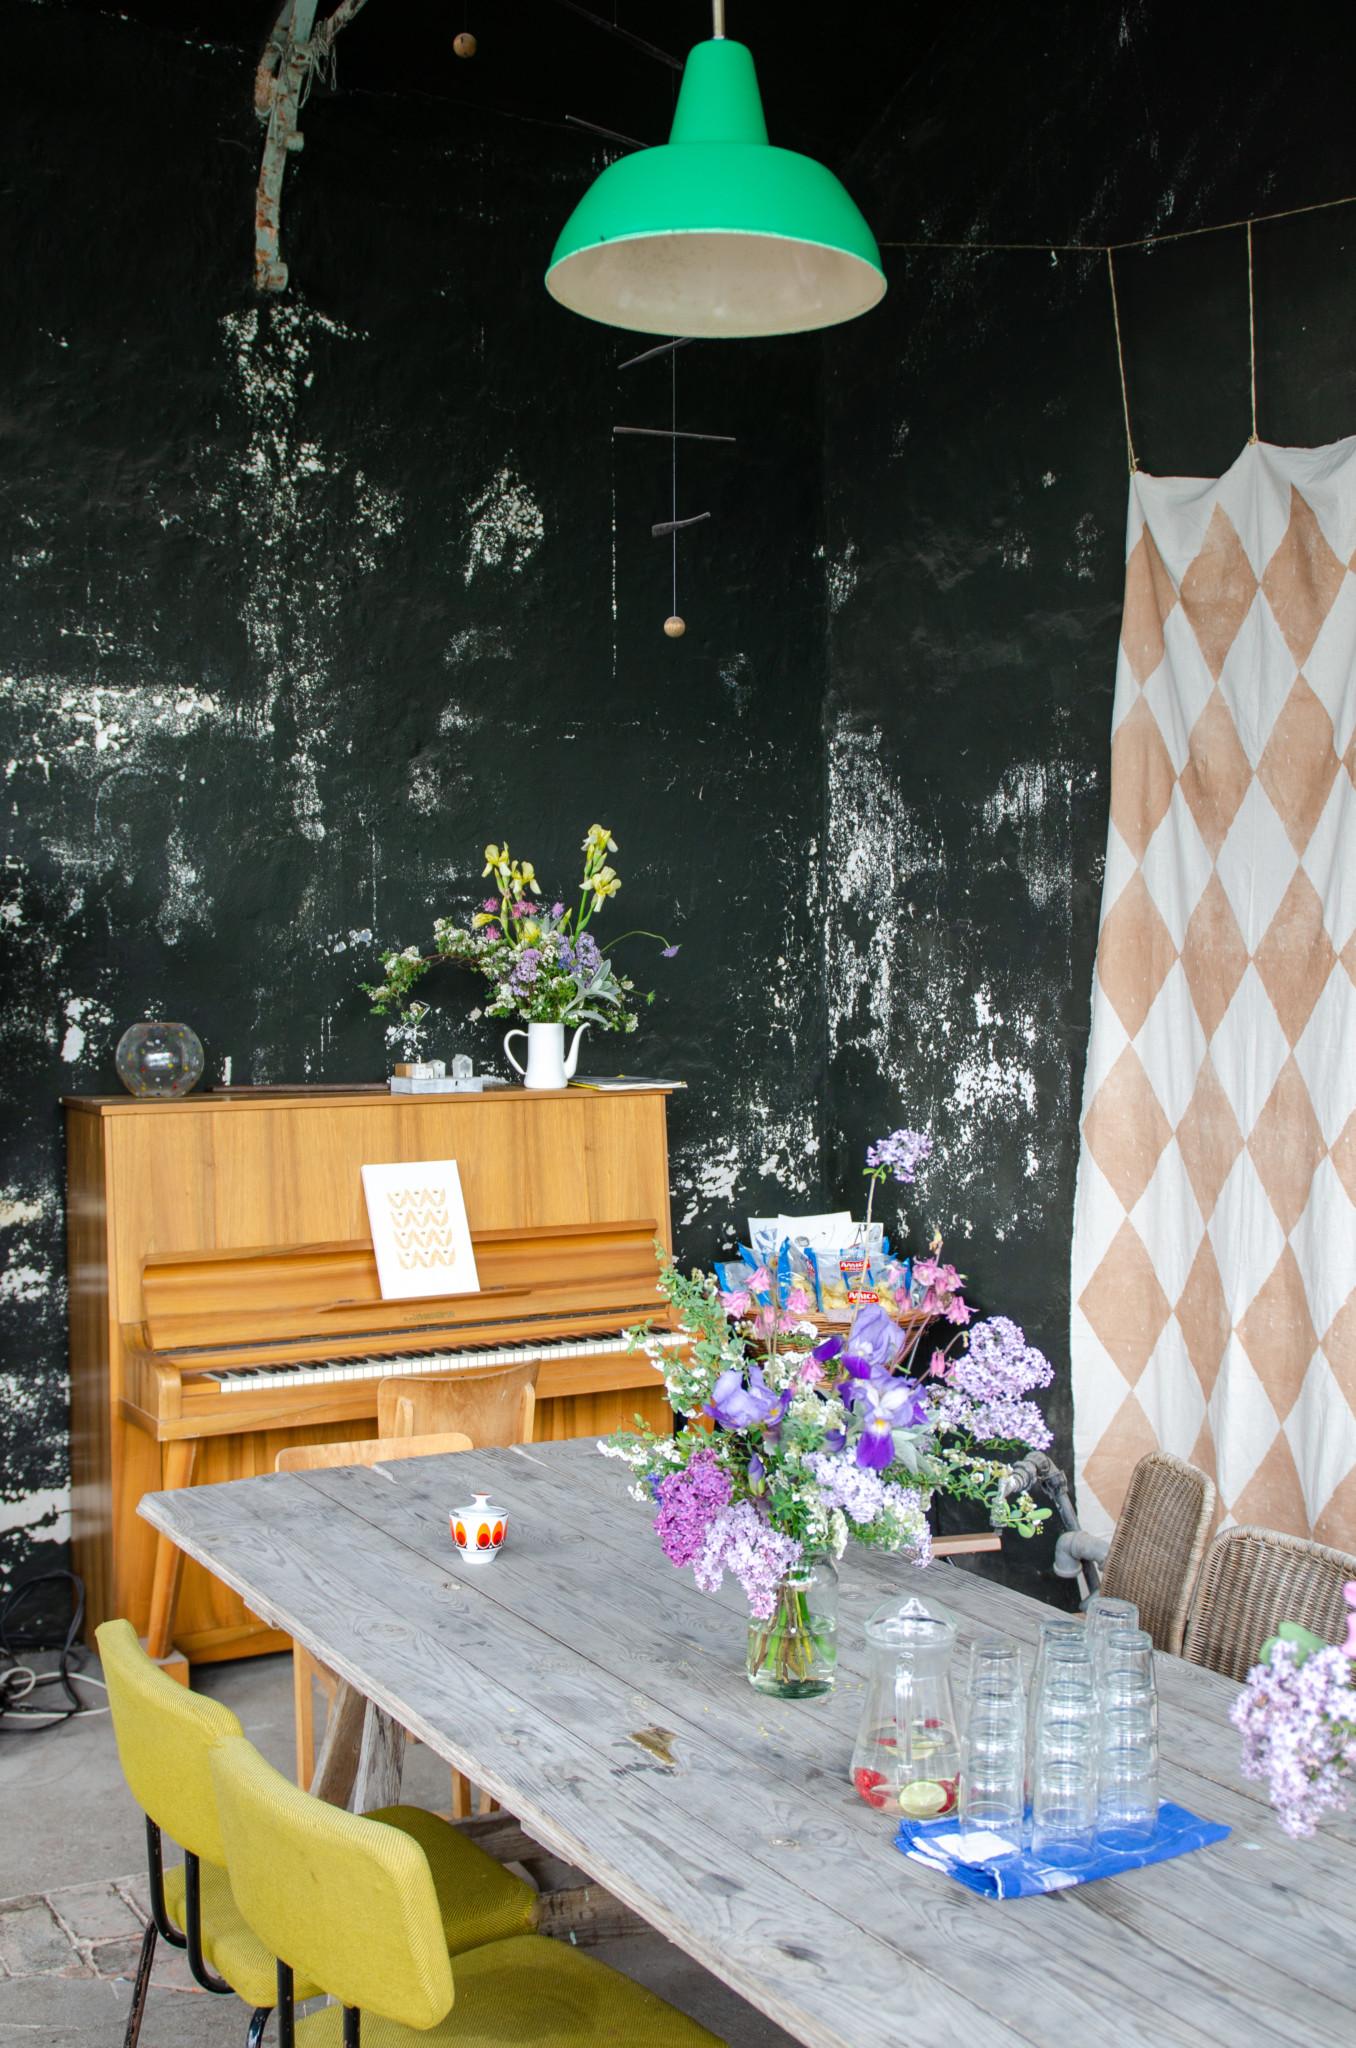 Café in Gerswalde